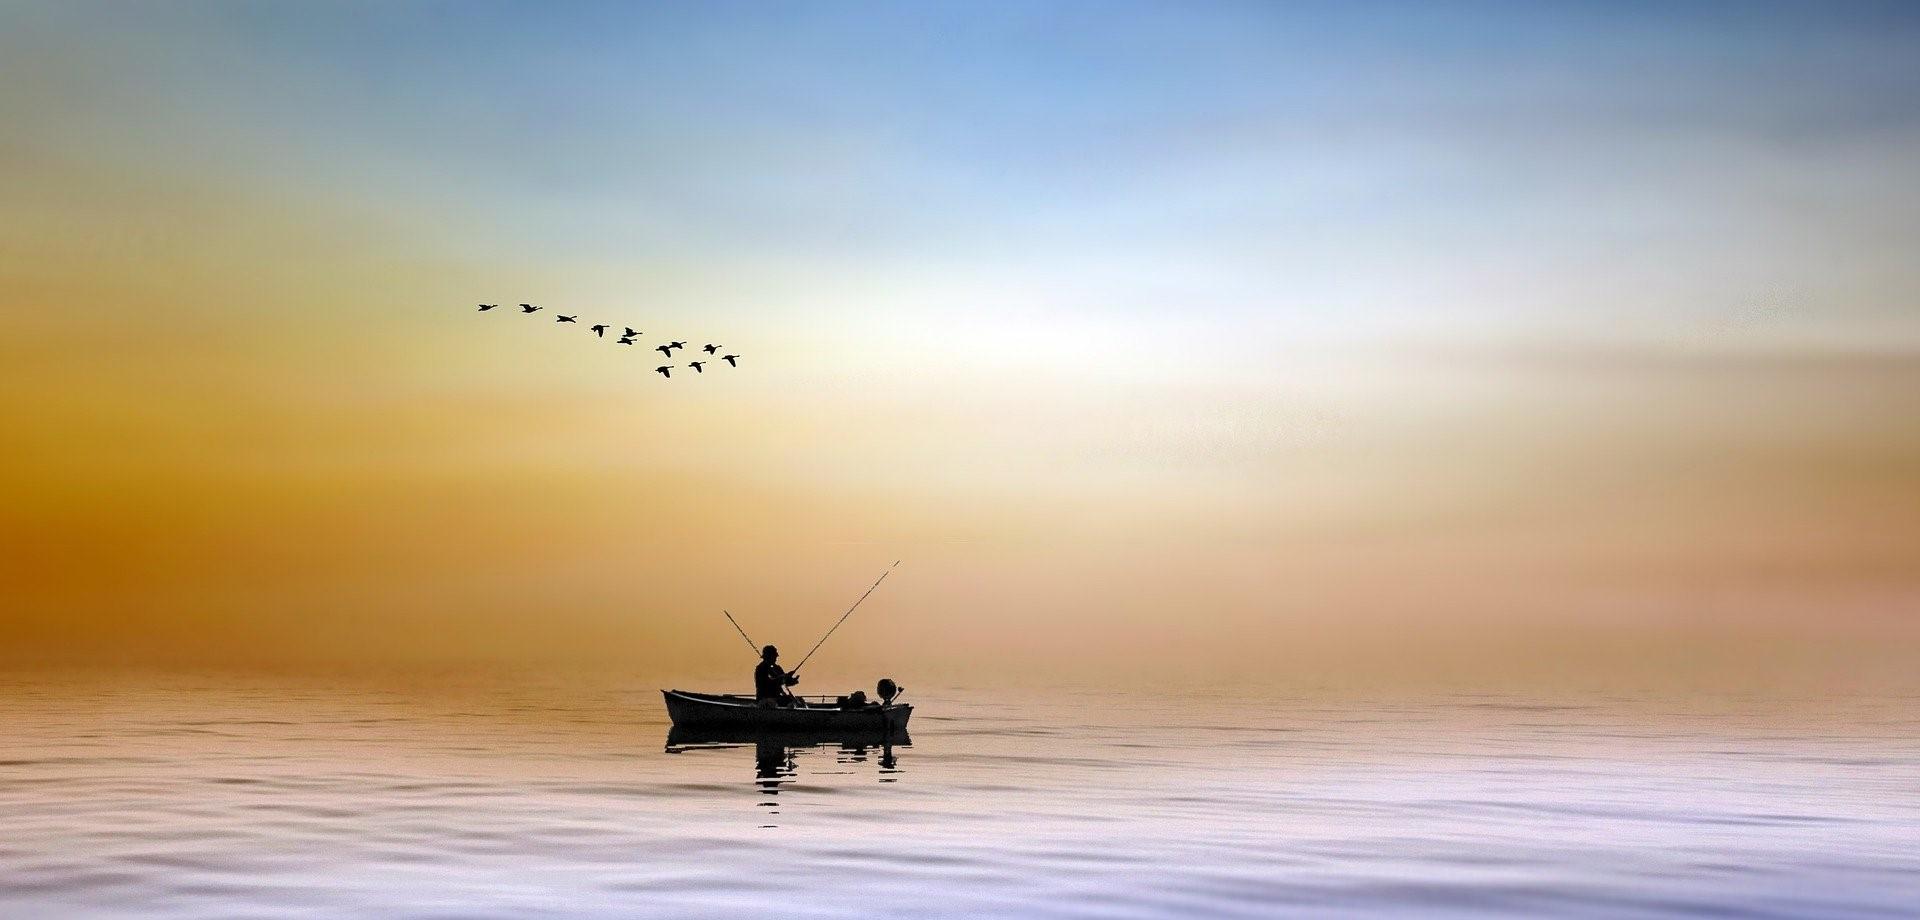 Fisherman Big and Small Meet in Philadelphia